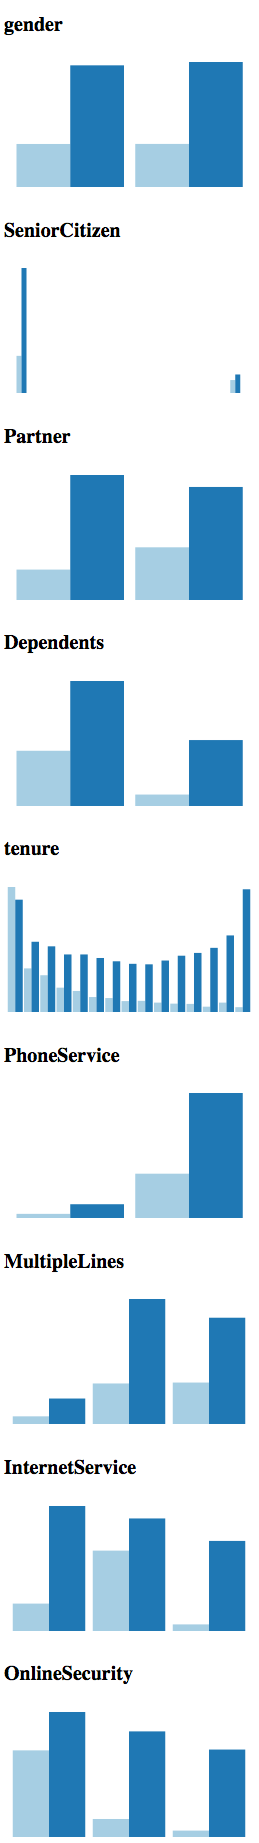 grouped-bar-chart-1c